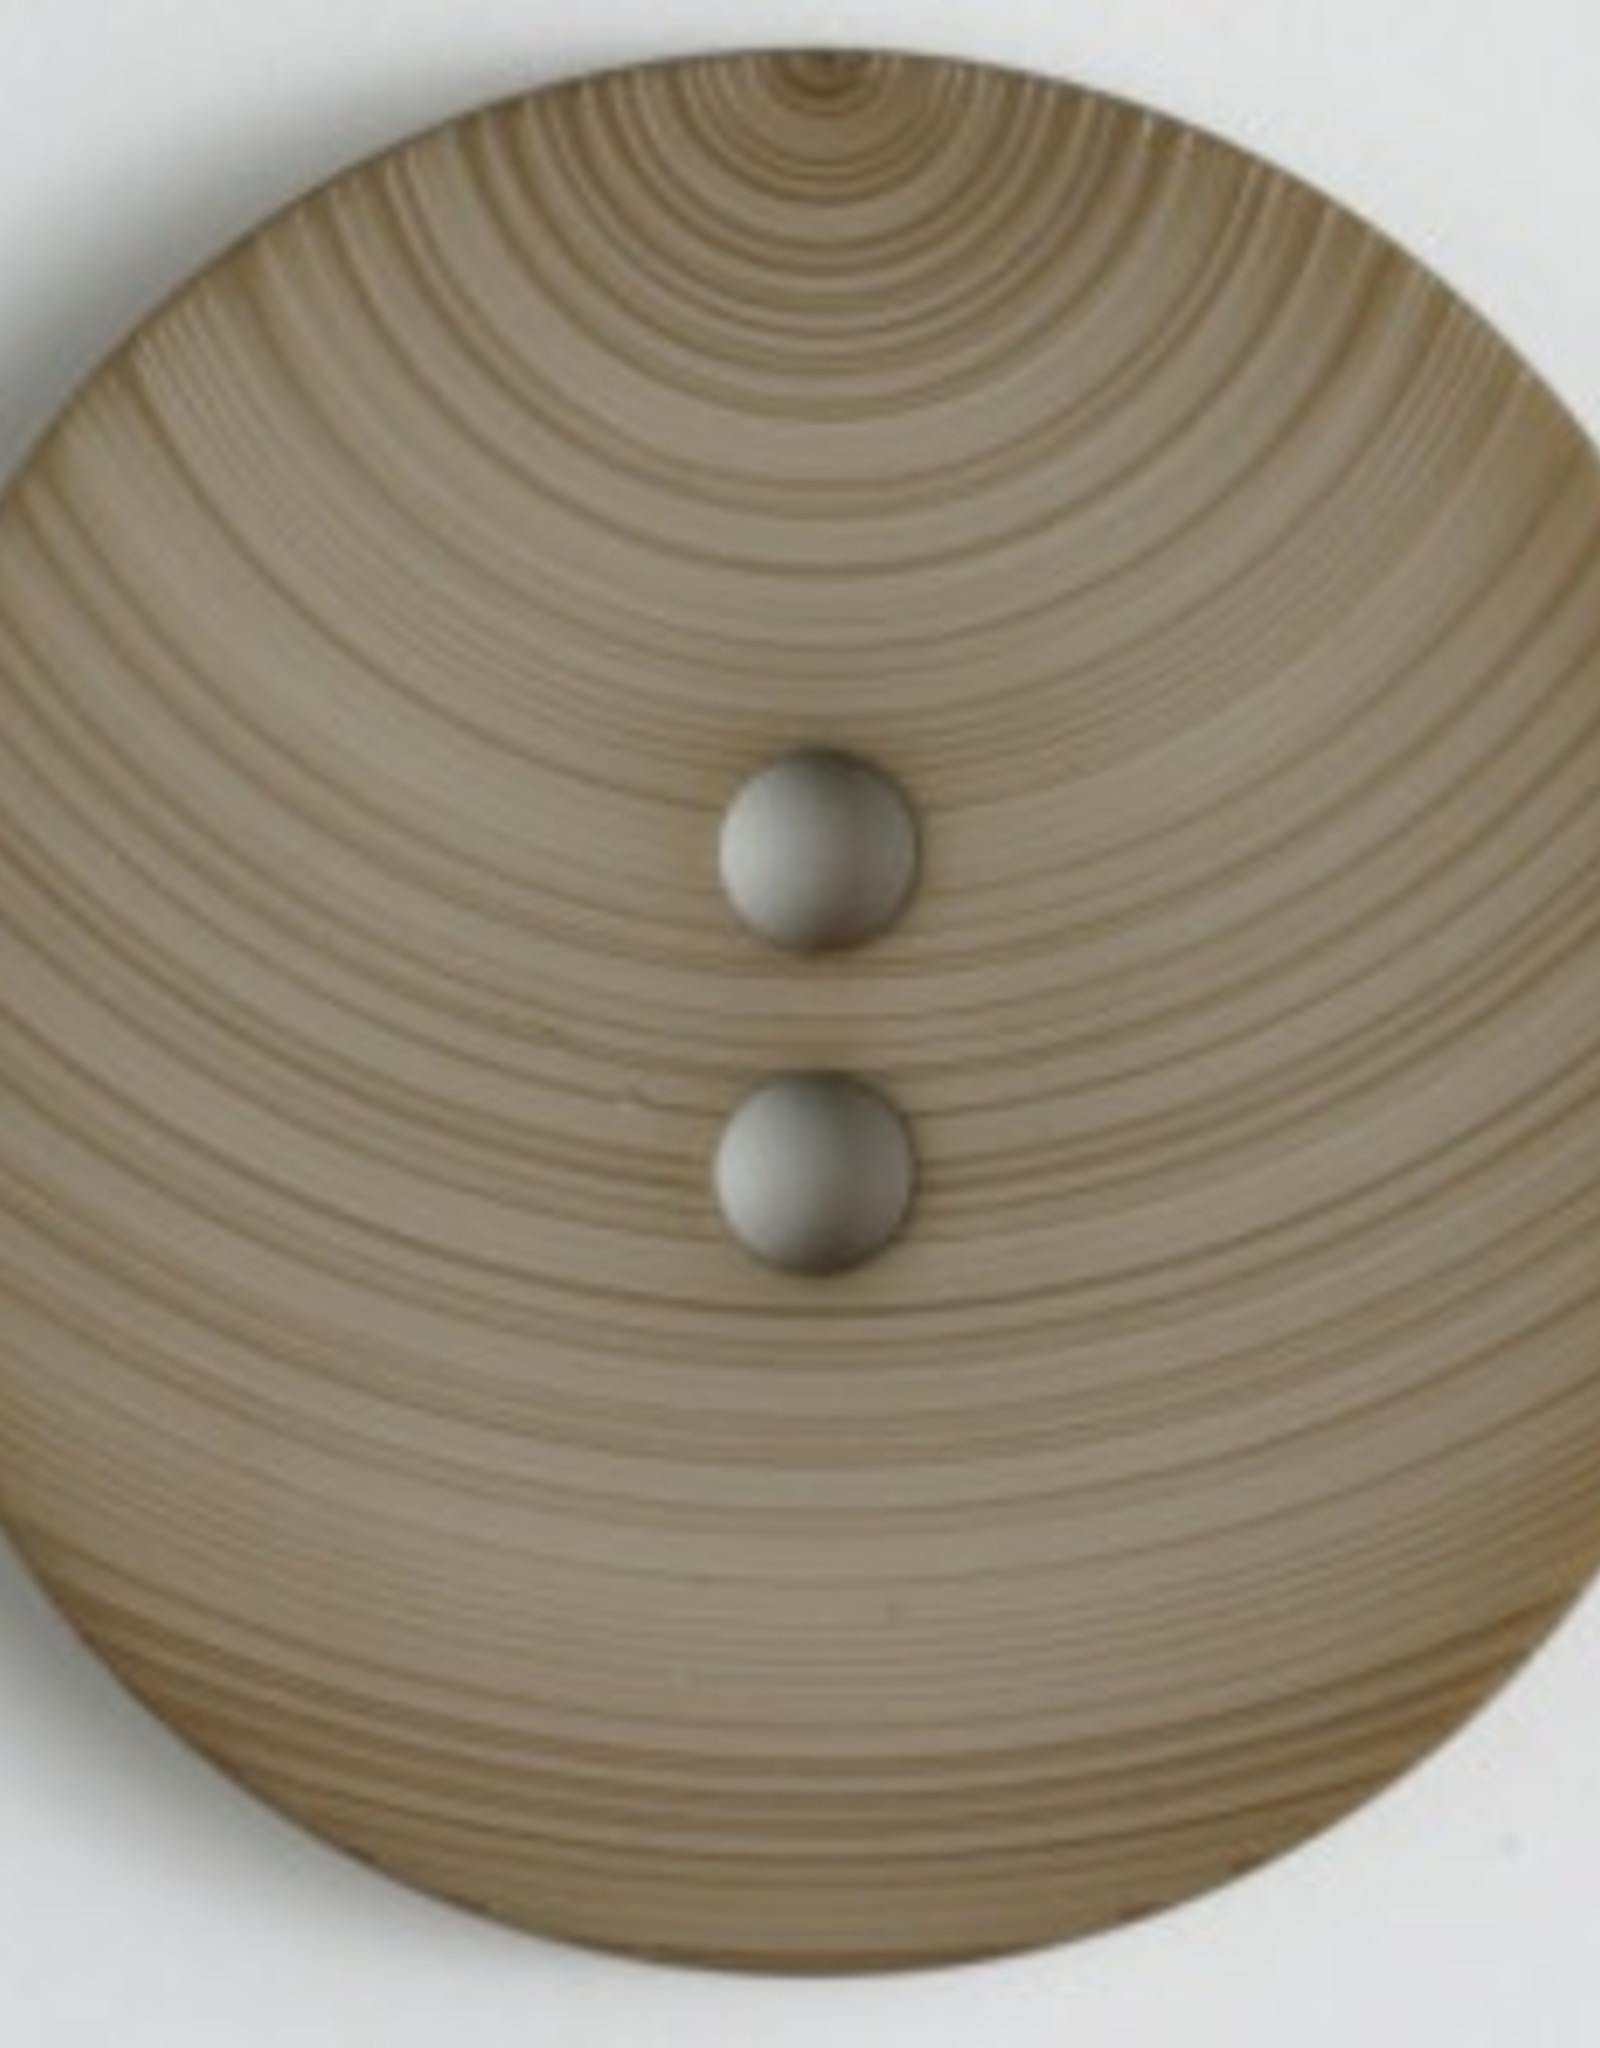 Dill Big Textured Button, 54 mm